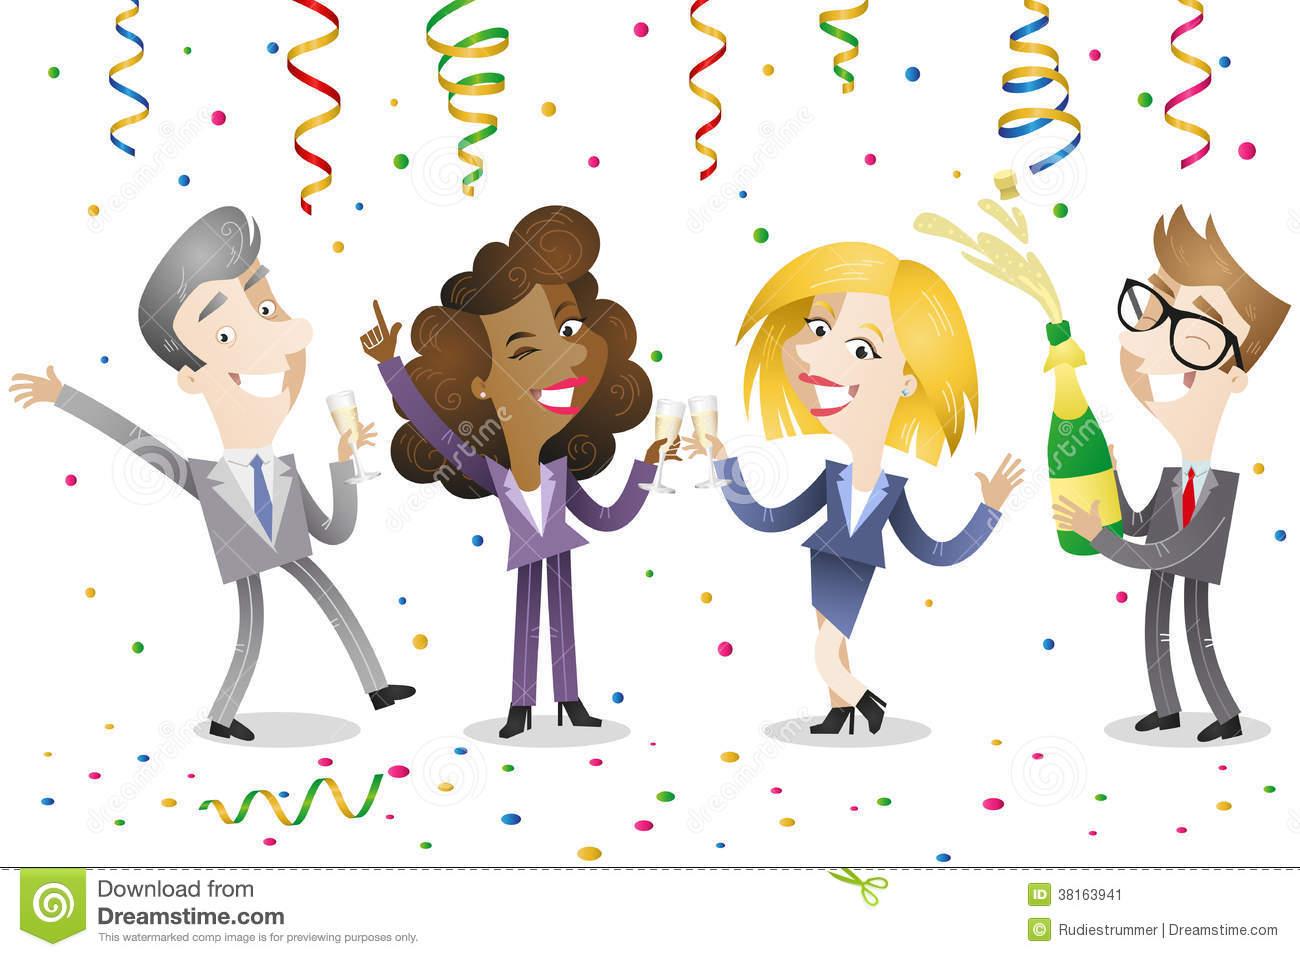 Birthday images celebrate. Celebration clipart office